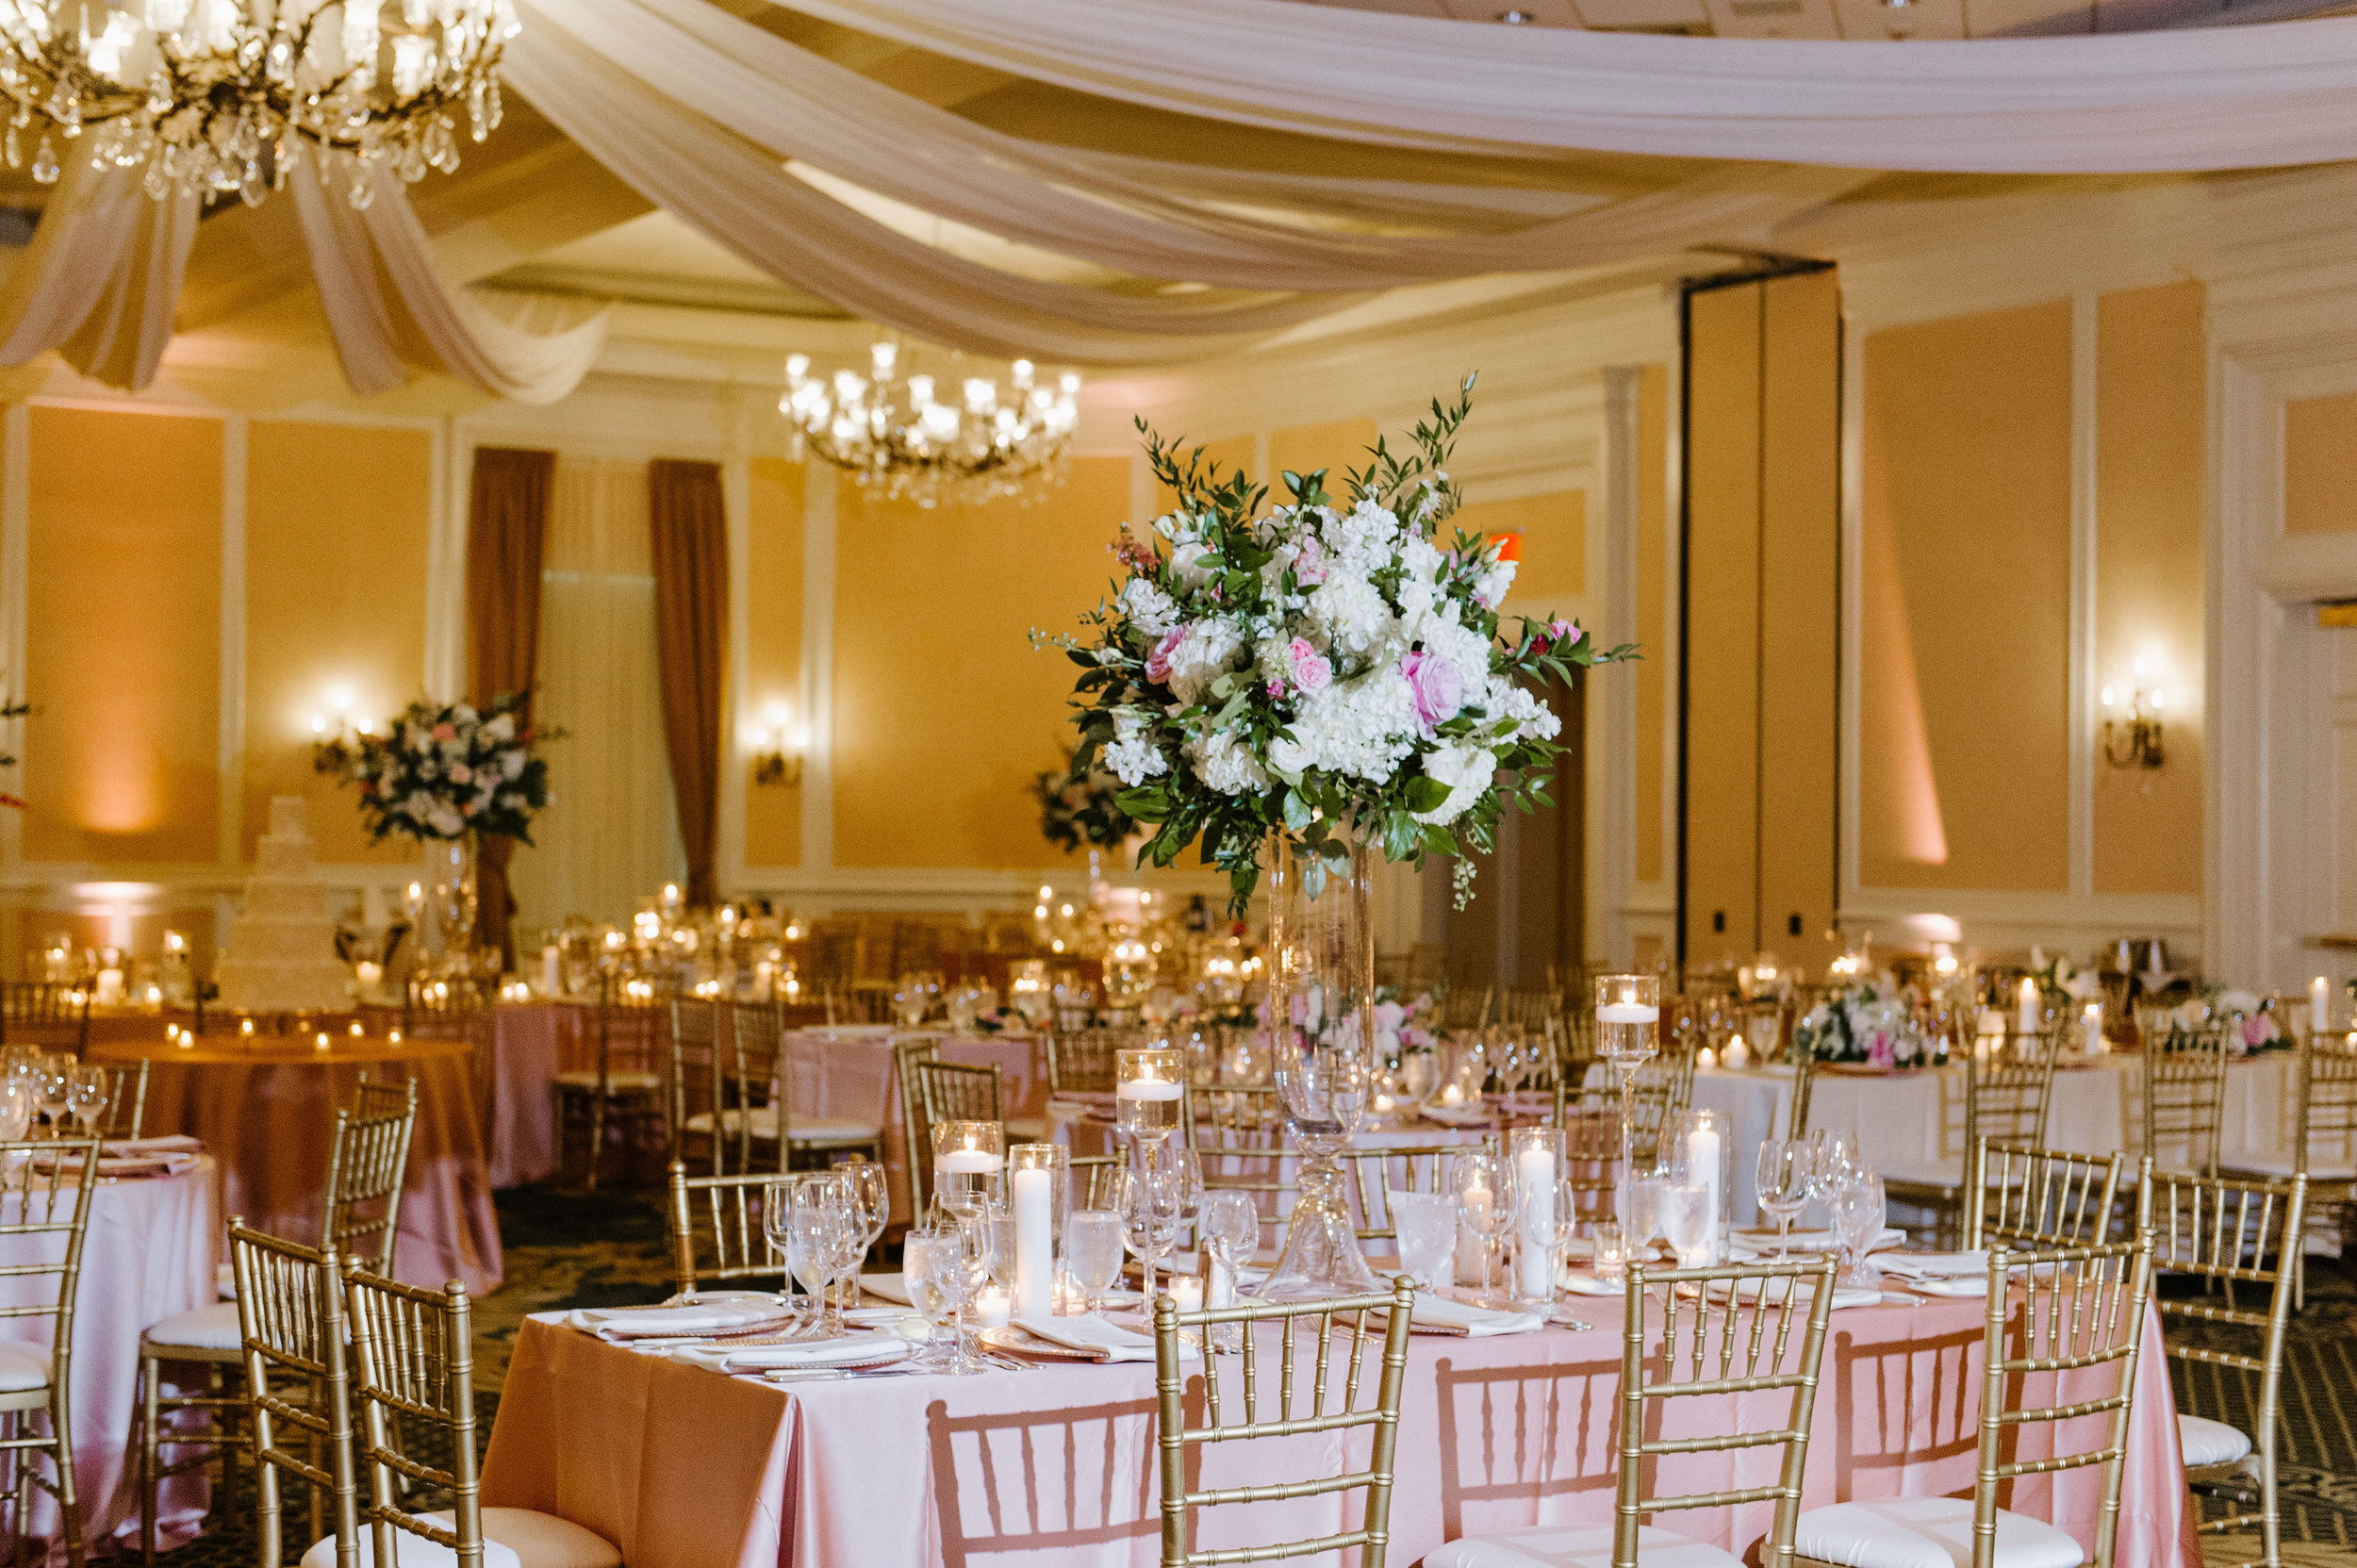 McElravey_Wedding_CarolineLimaPhotography_2018_292.jpg